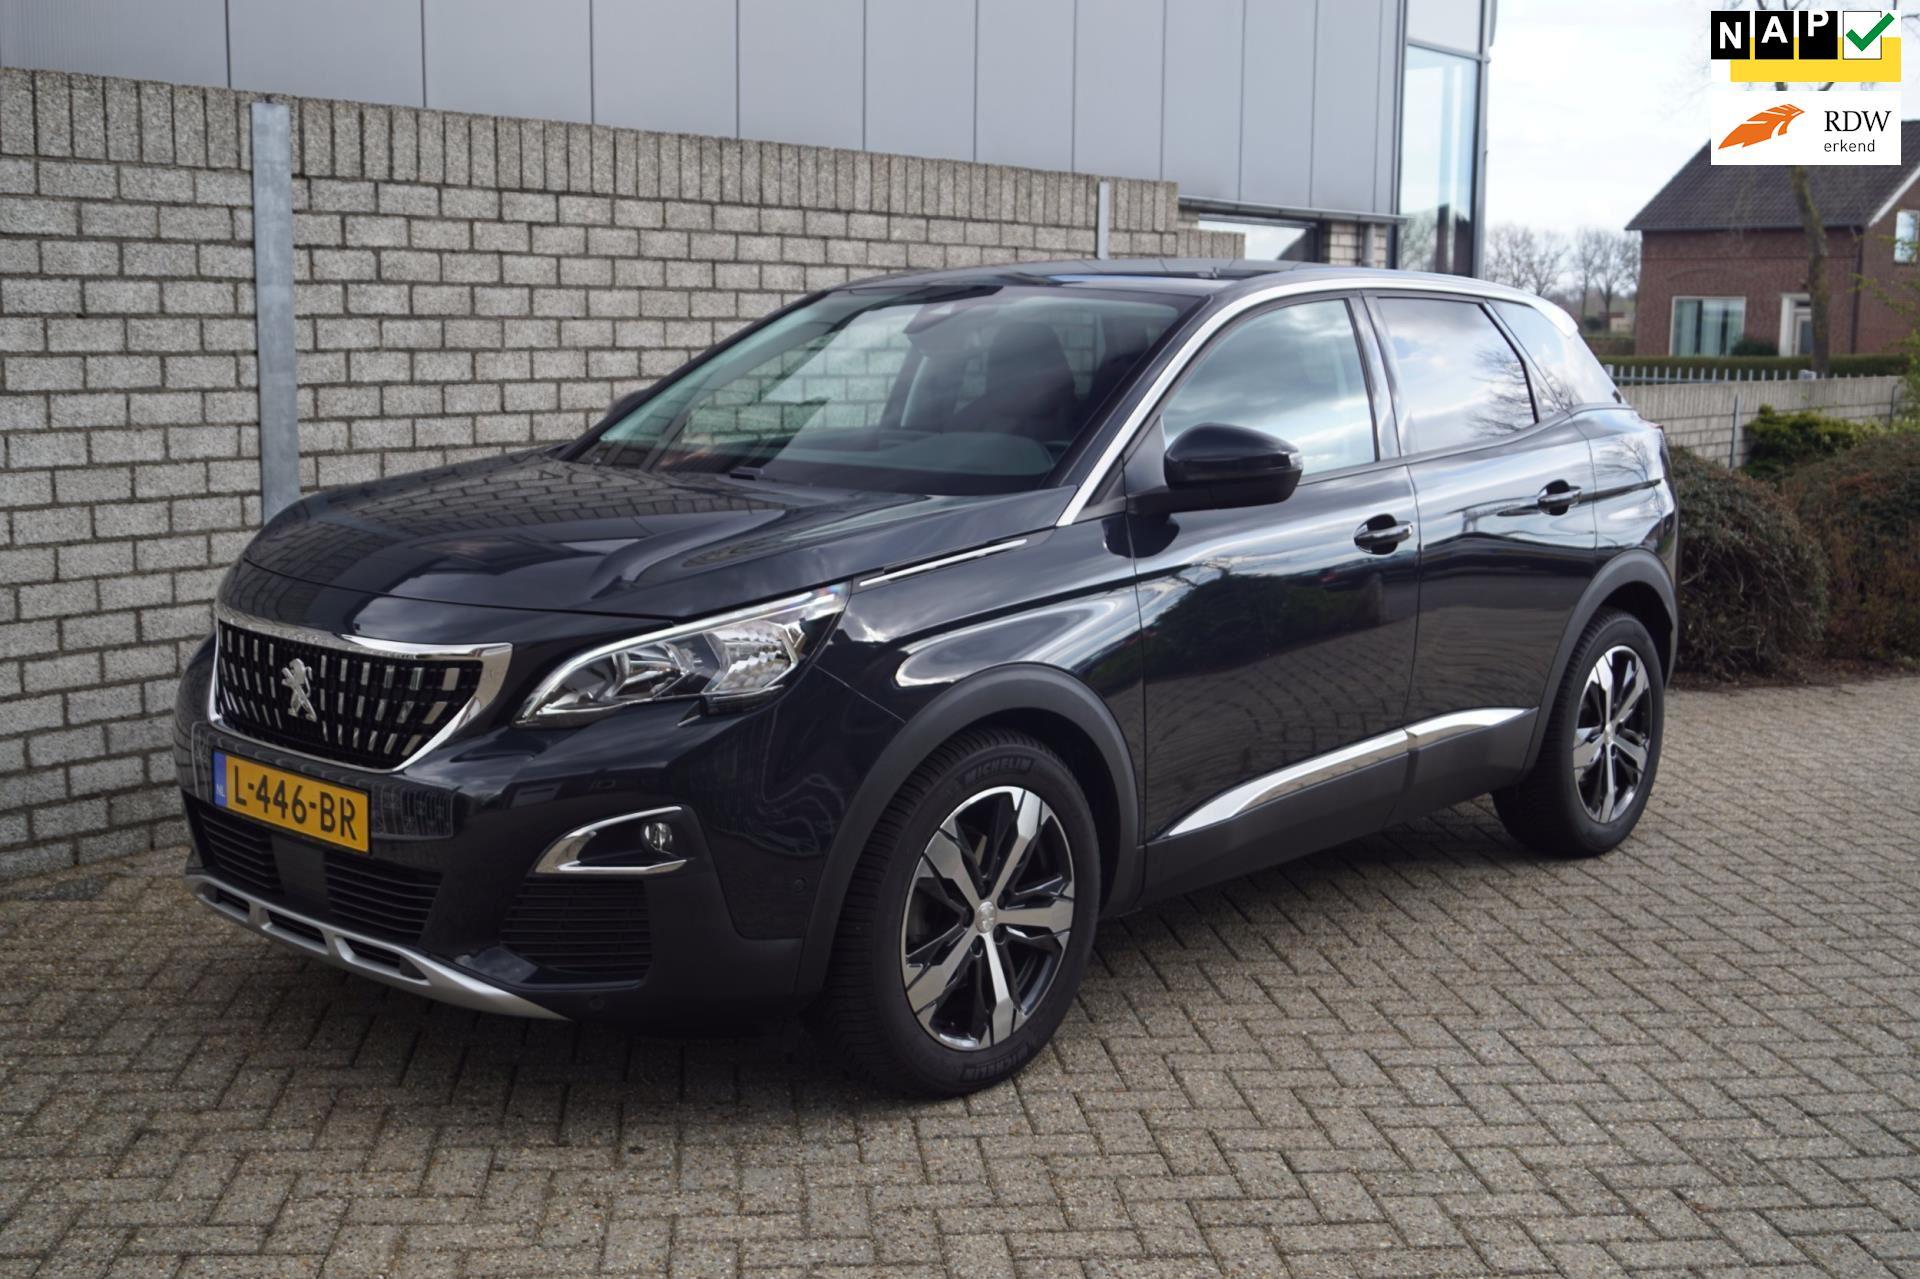 Peugeot 3008 occasion - Autobedrijf H. Wijdeven V.o.f.